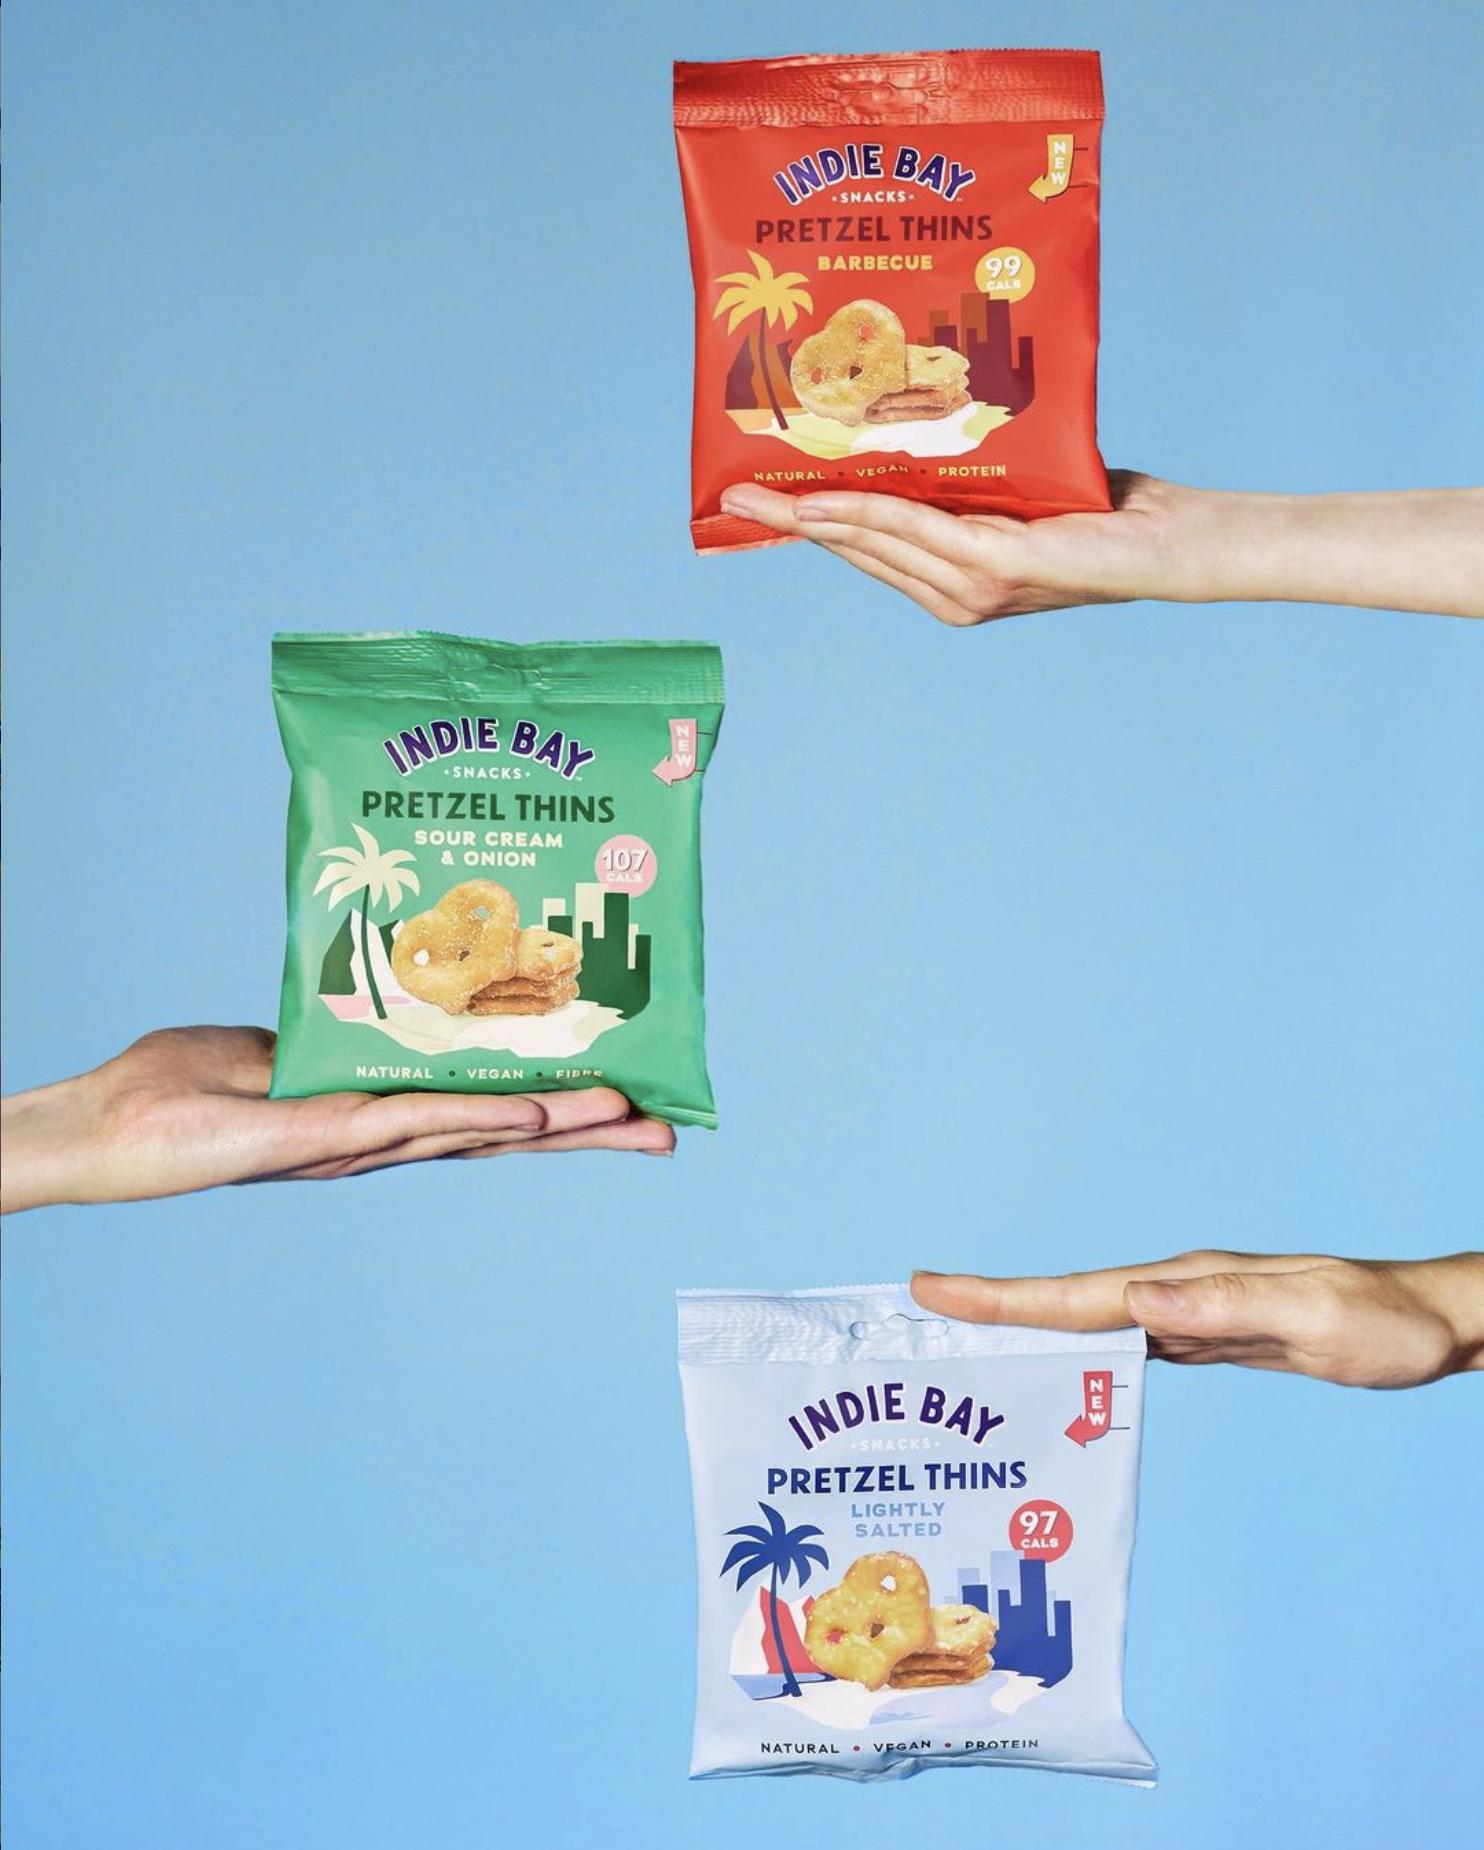 3 hands holding bags of pretzels